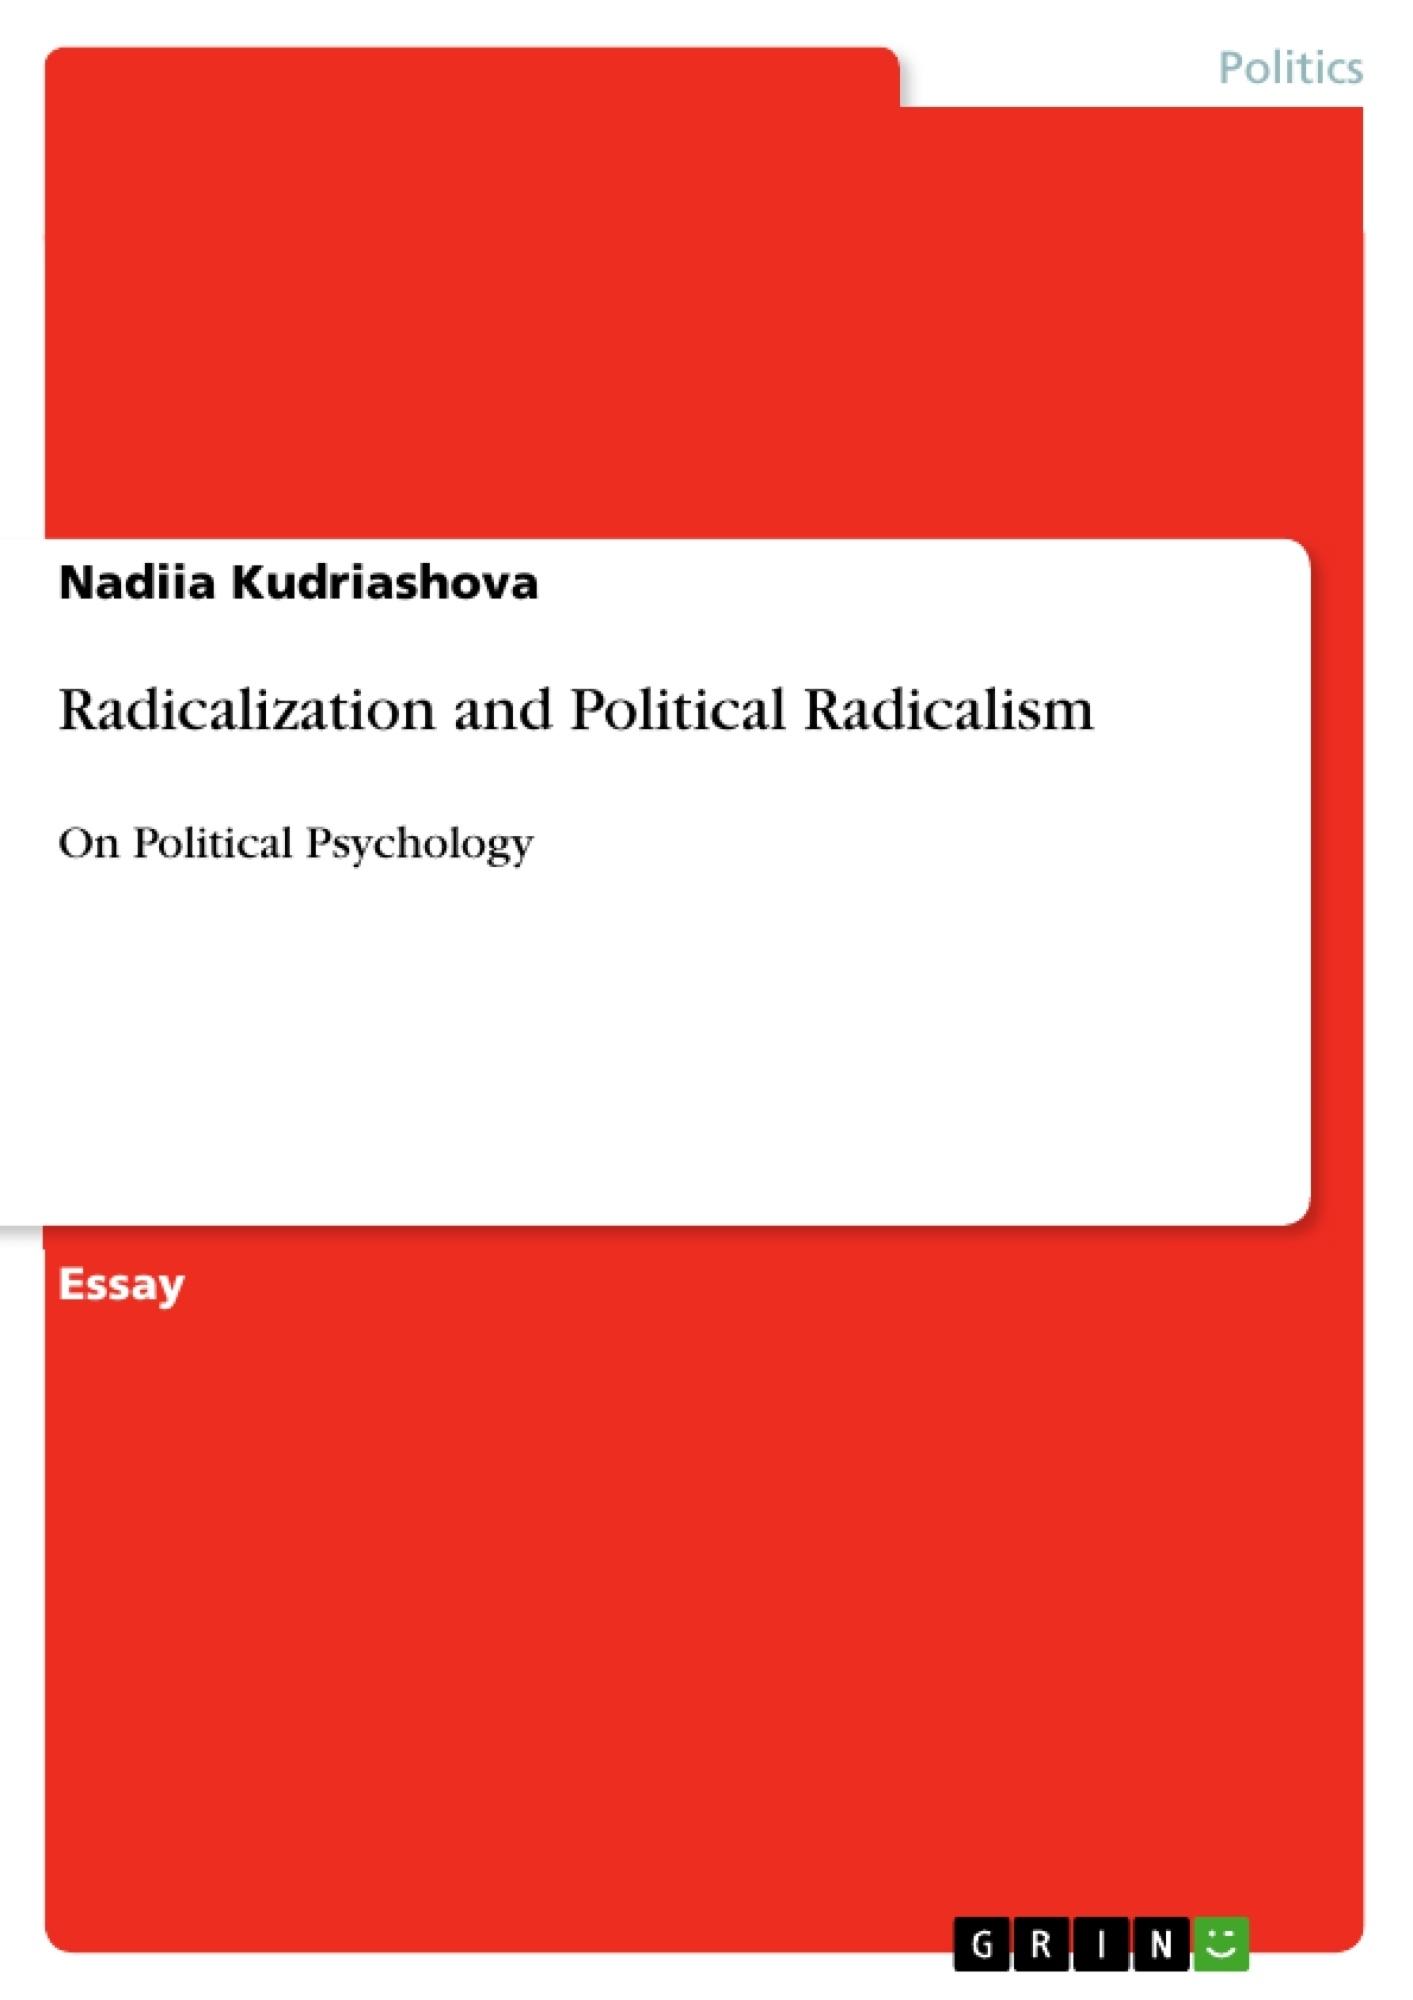 Title: Radicalization and Political Radicalism